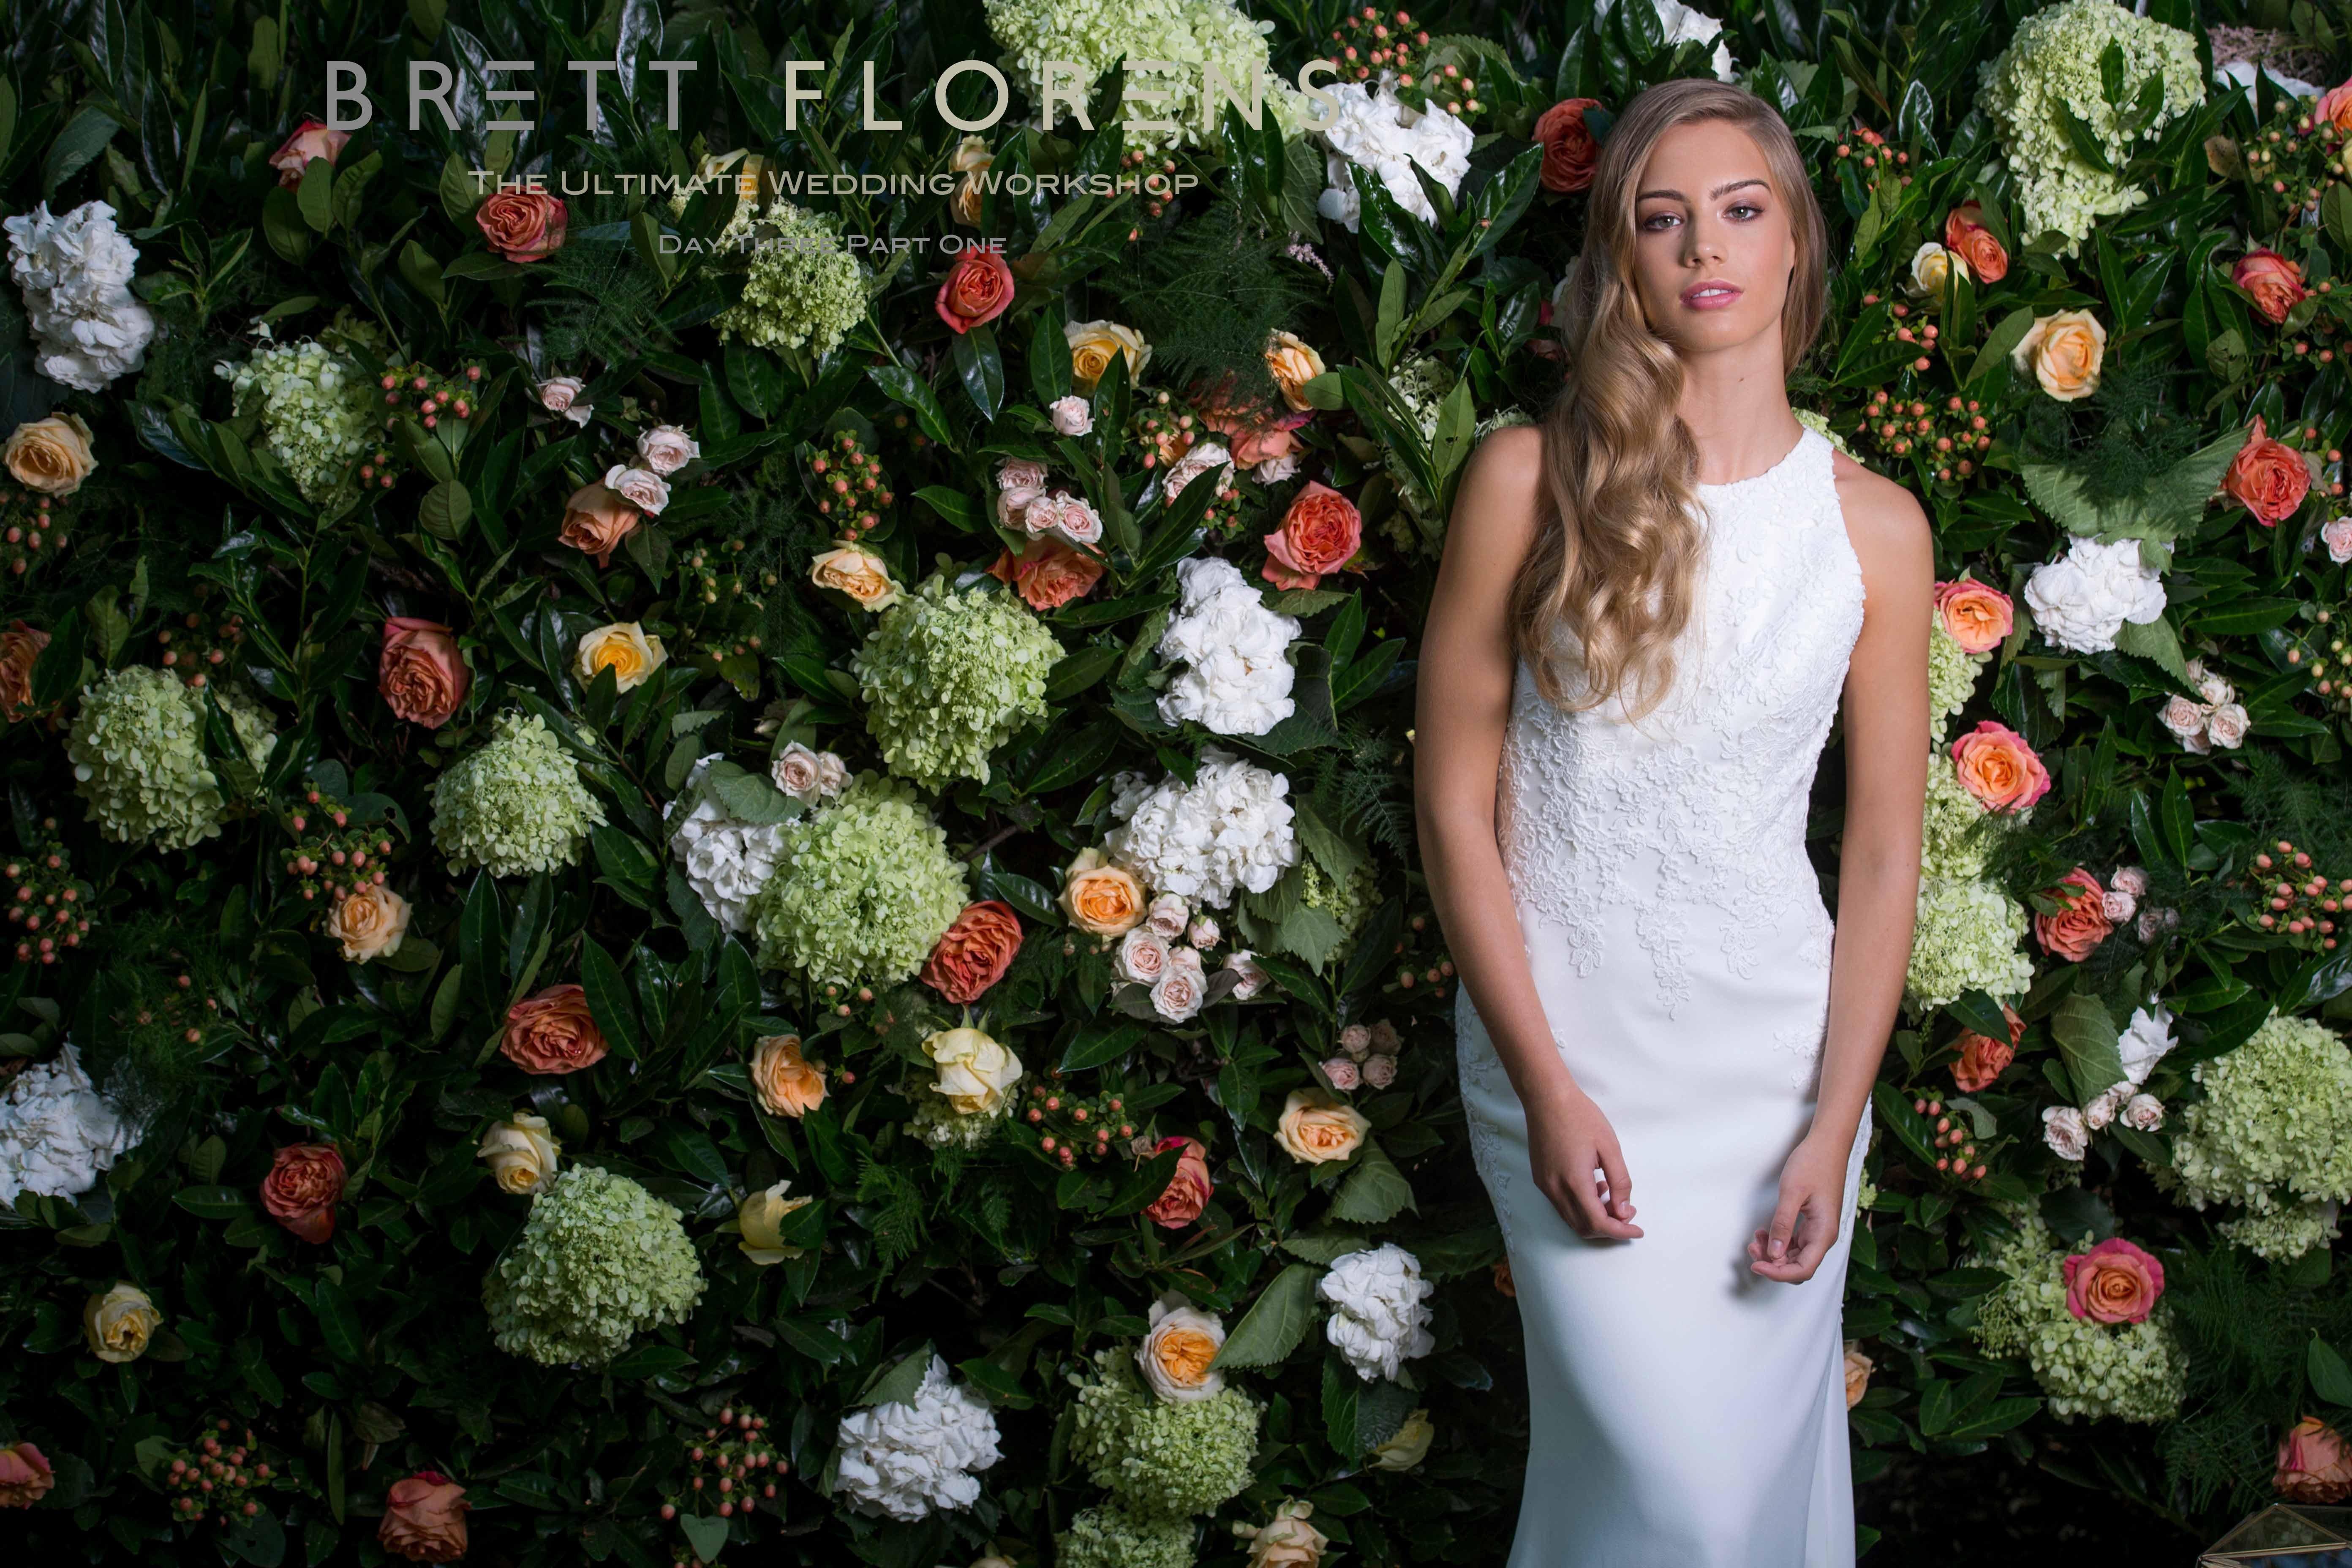 wedding photography workshop 6